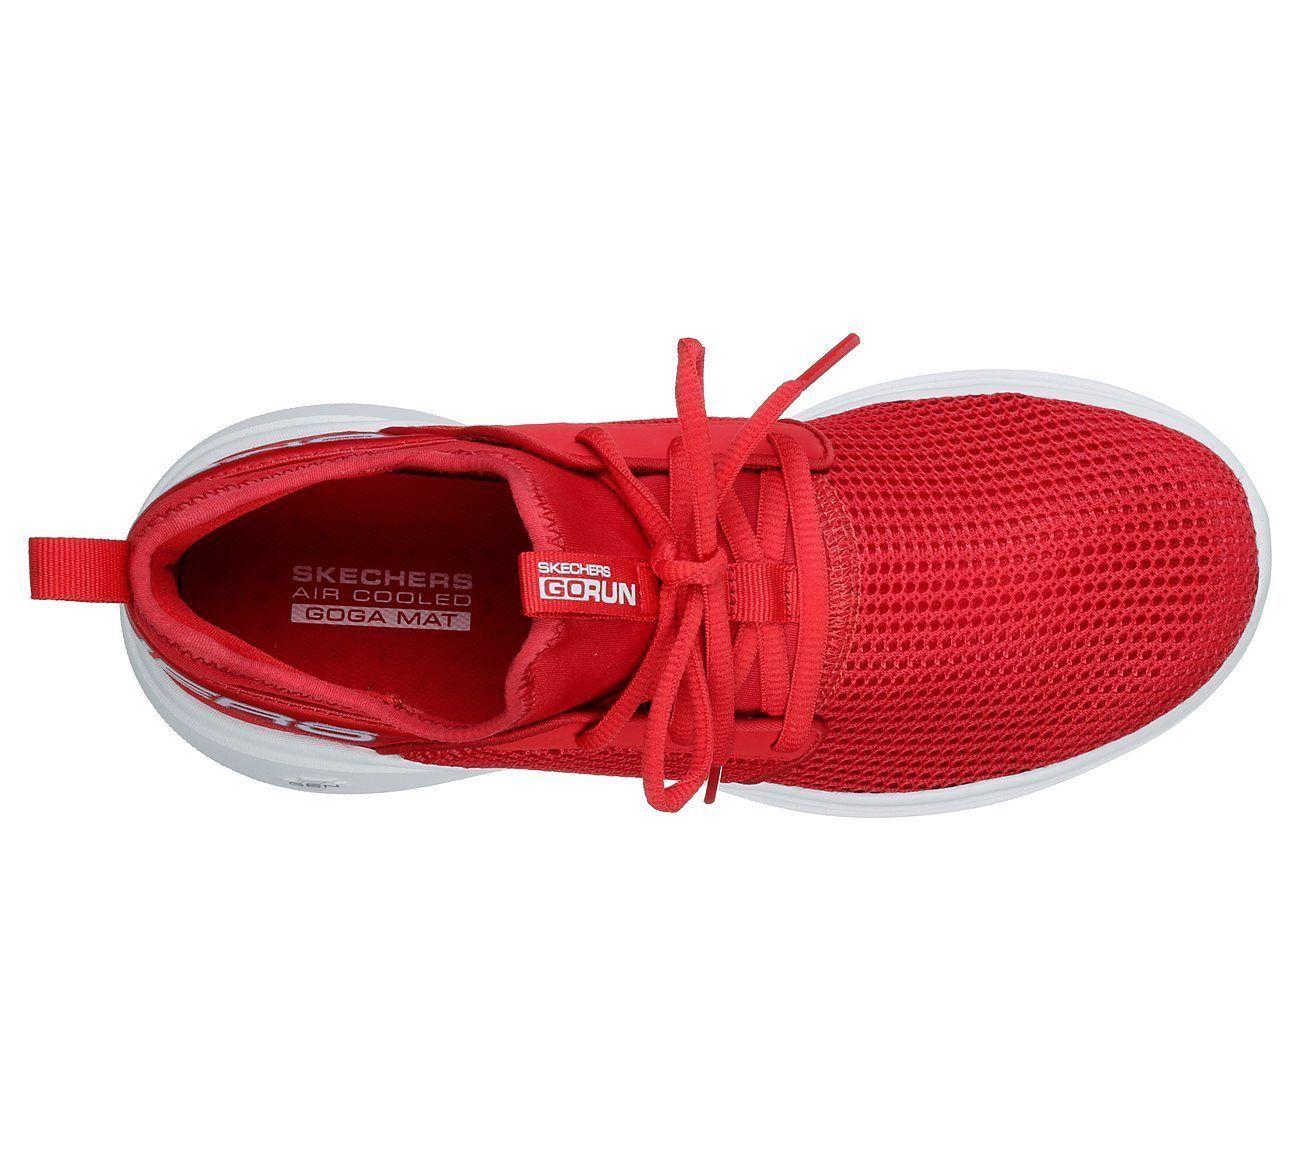 Skechers Red GO Run Fast shoe Women Sport Workout mesh Comfort Casual Soft 15103 image 5